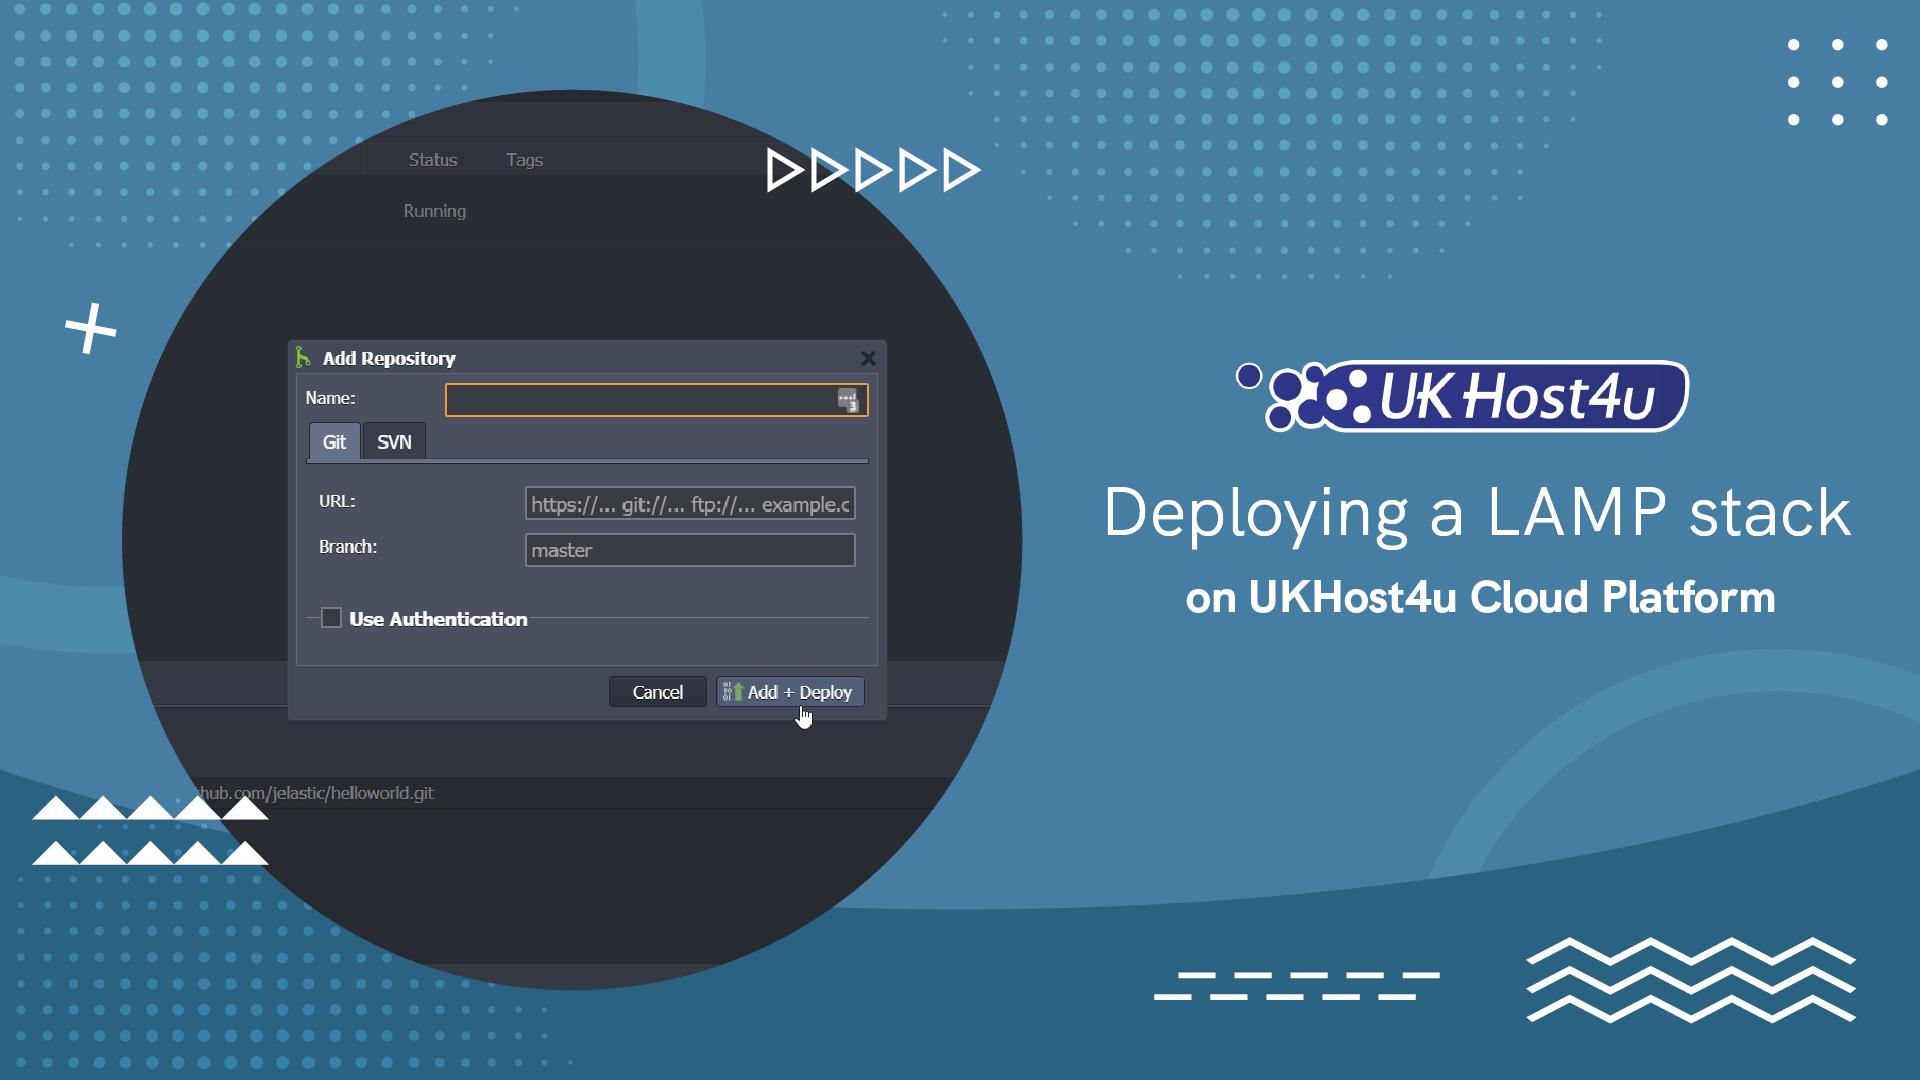 deploy-LAMP-stack-ukhost4u-cloud-solutions